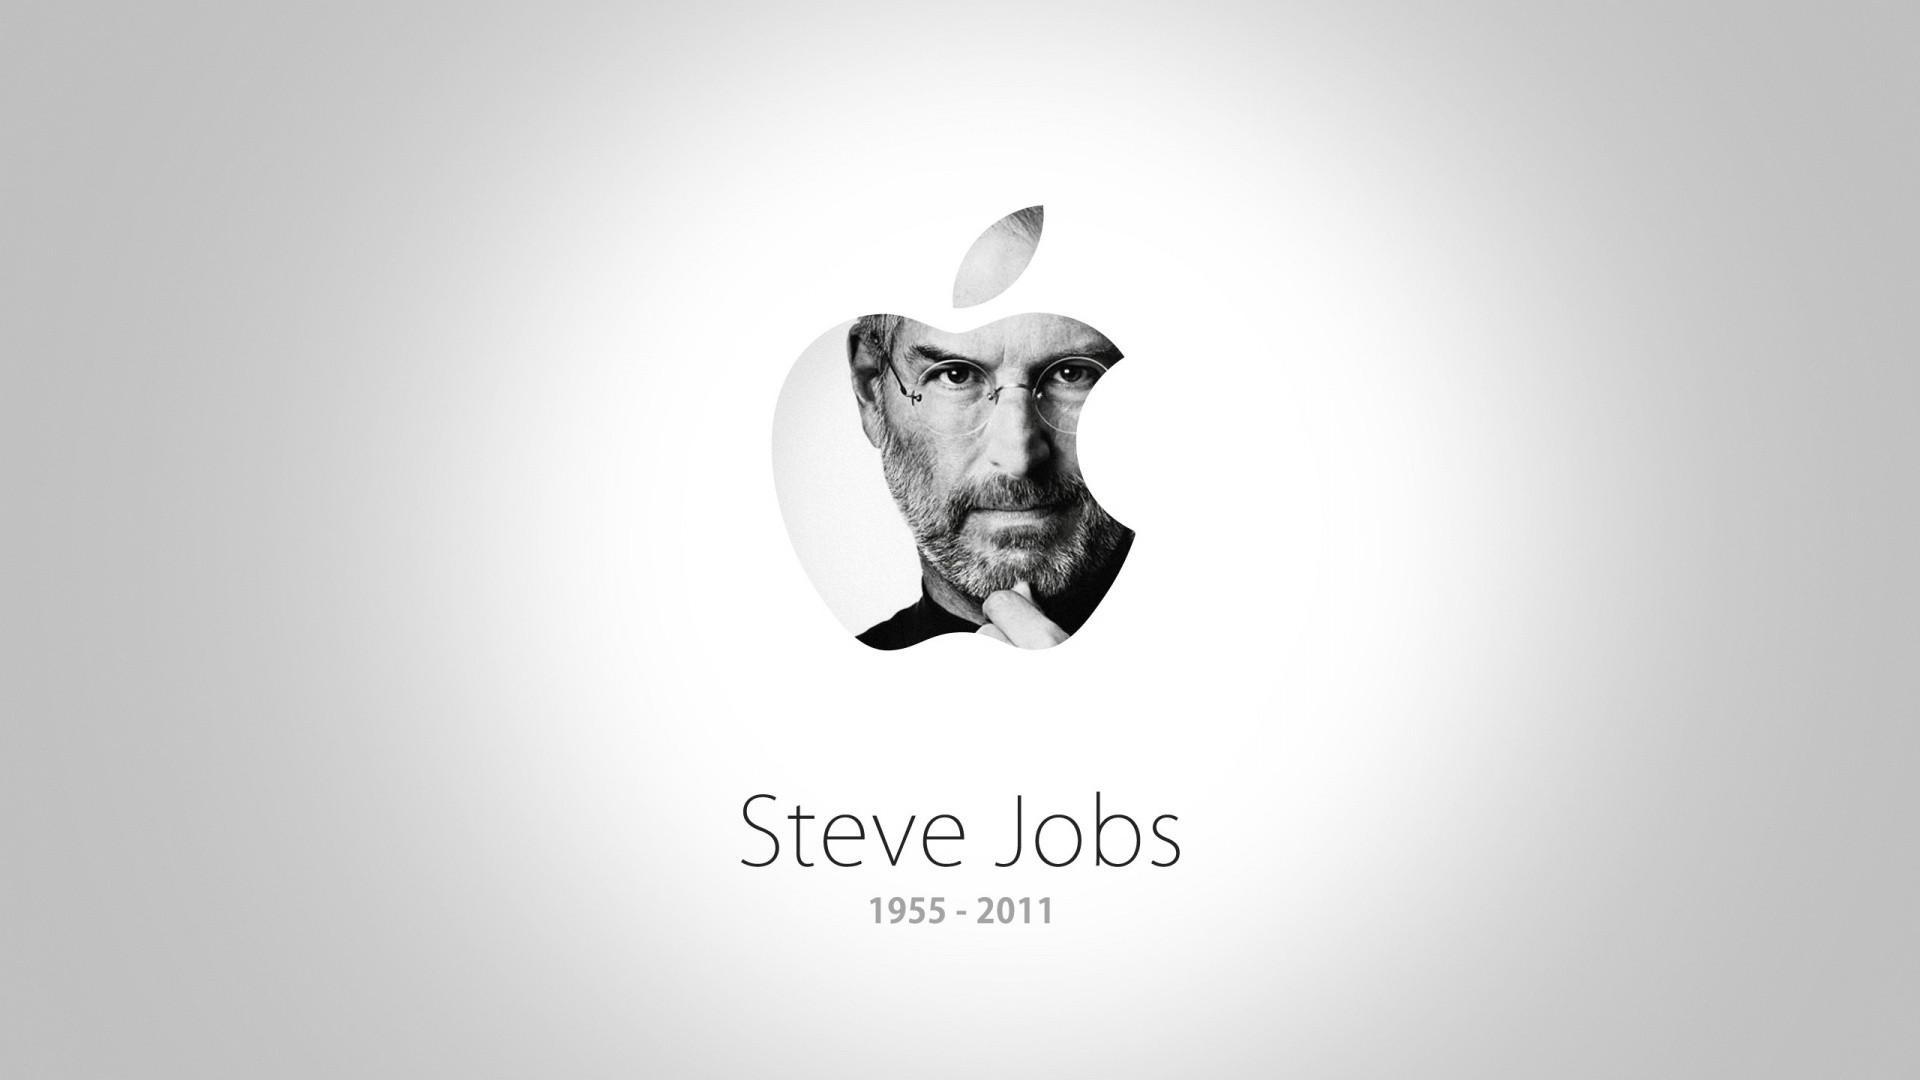 Steve Jobs hd wallpaper